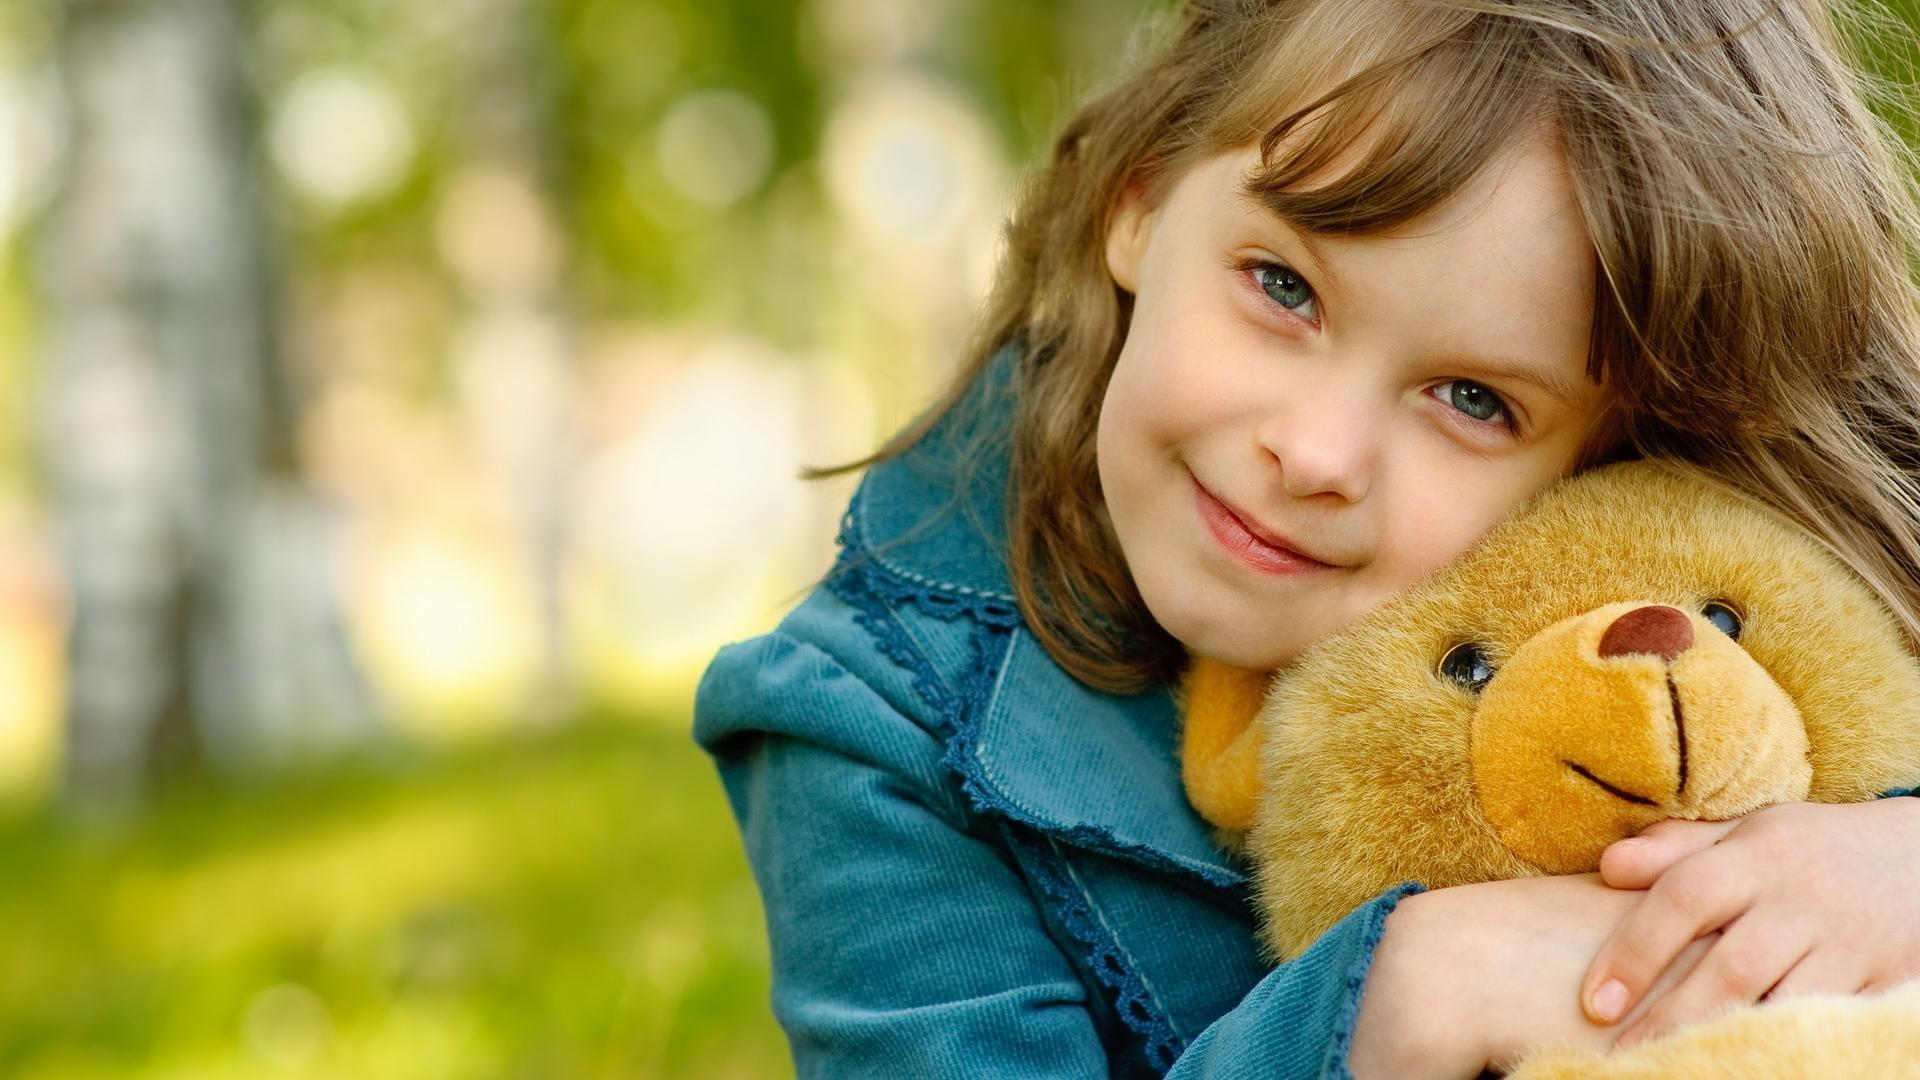 Child Girl Toy Smile